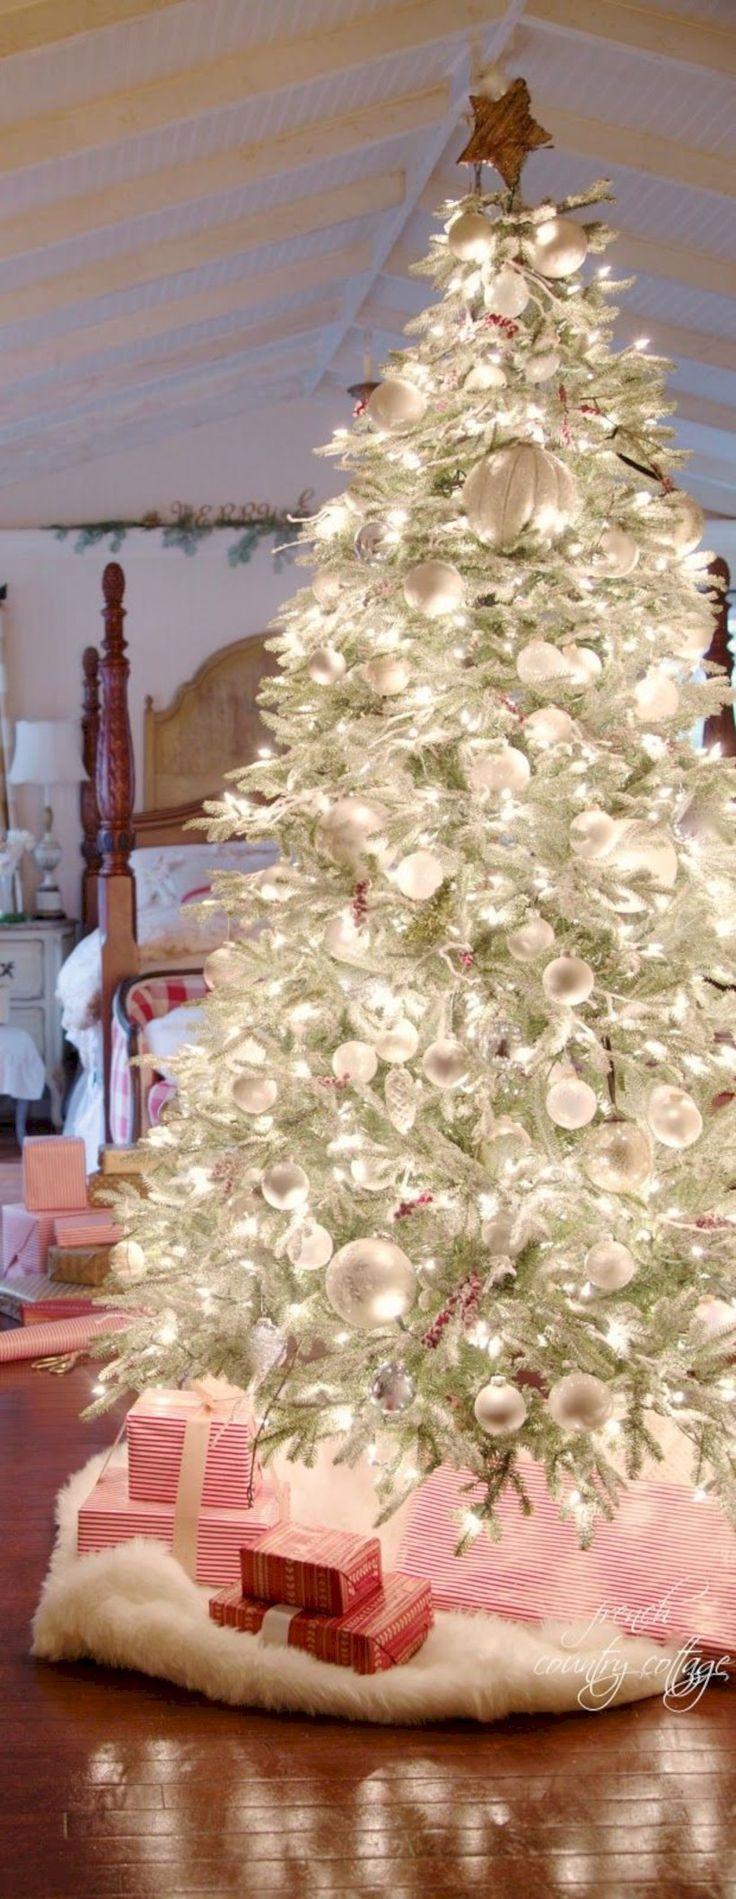 Cool Christmas Tree Decorating Ideas